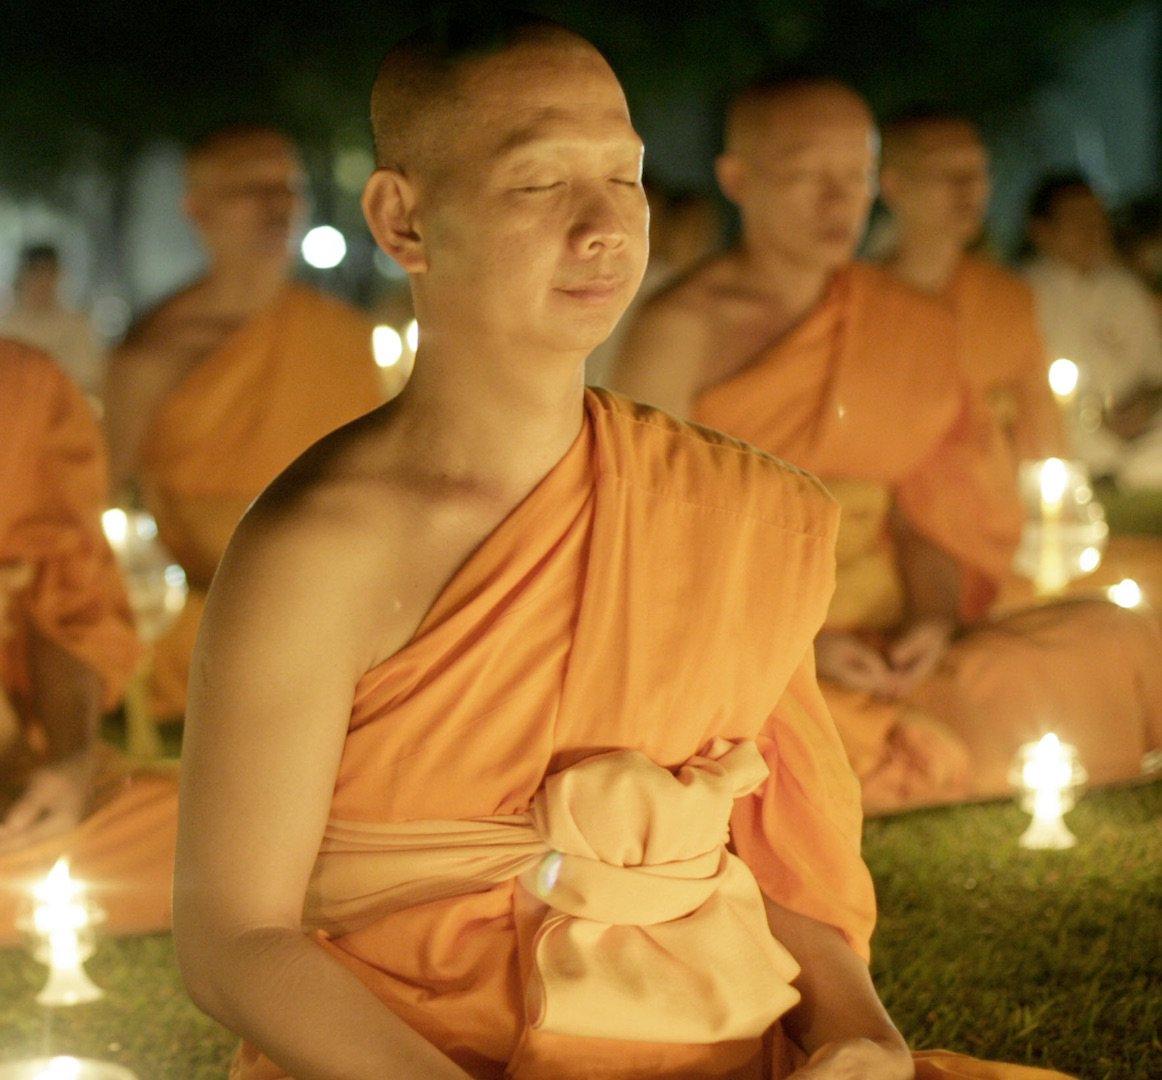 Meditation can be a clarifying exercise https://t.co/c5qzuzLE13